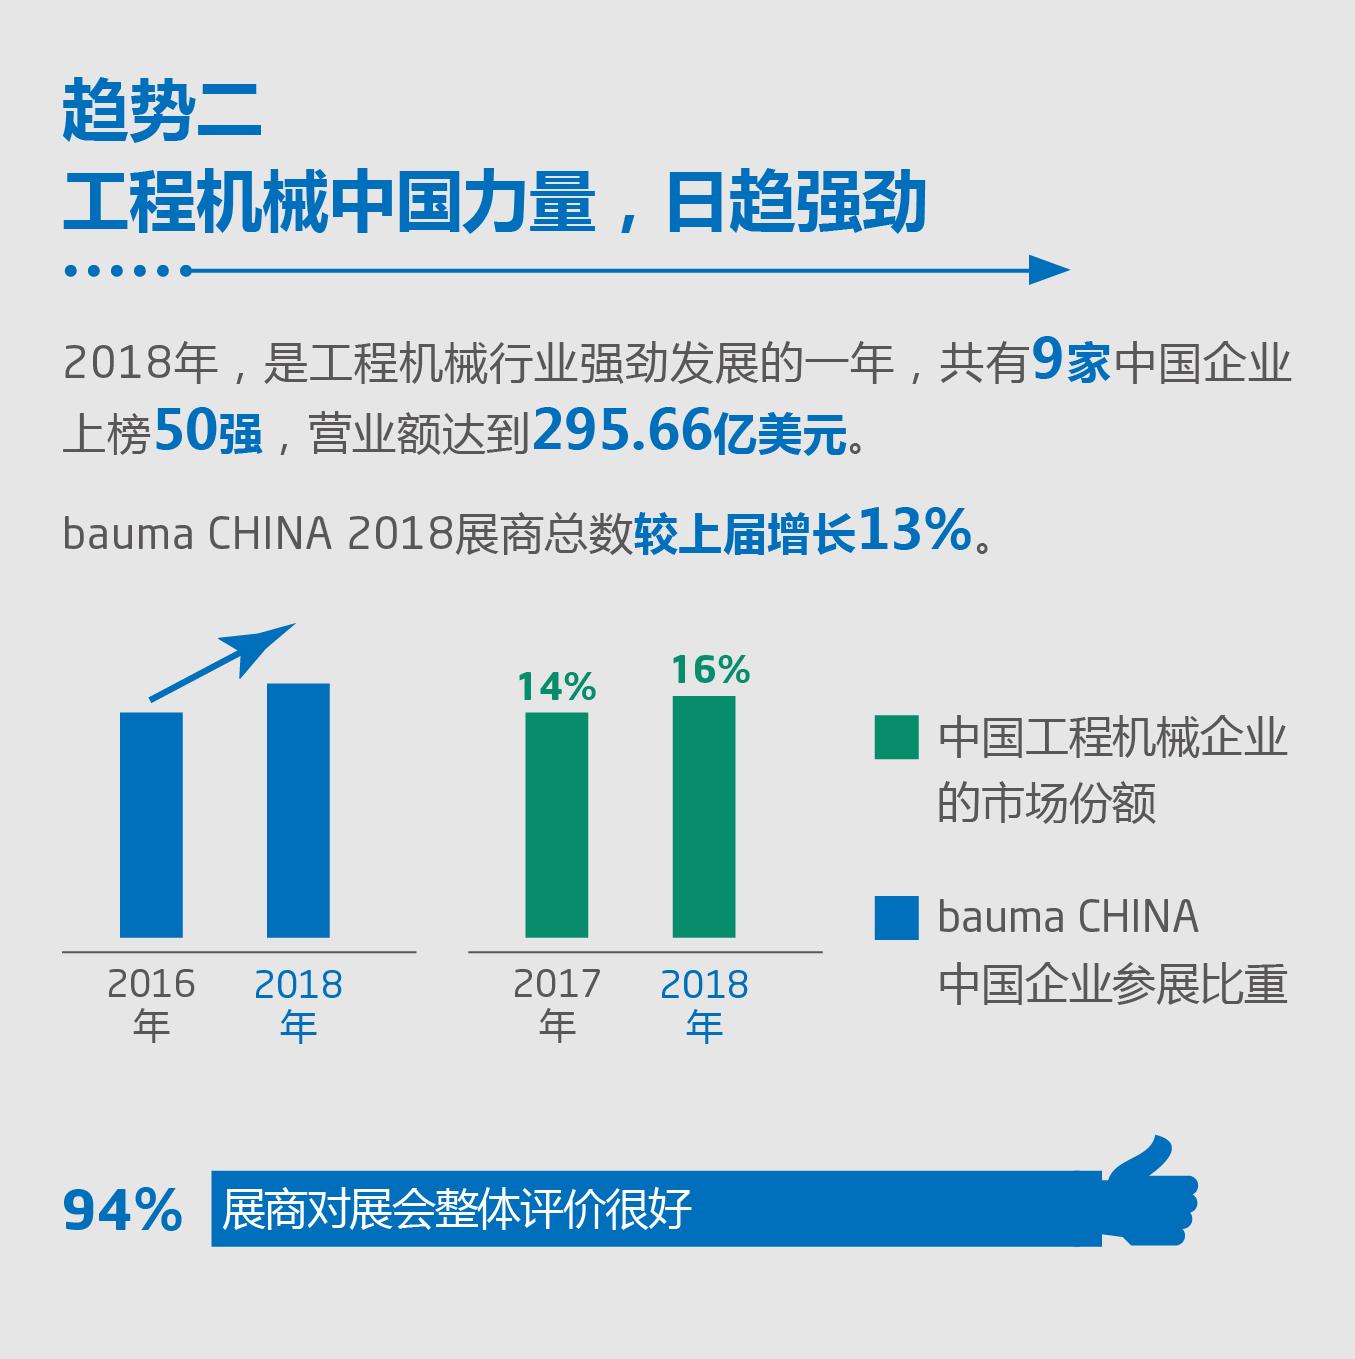 20bC_%E5%BE%AE%E4%BF%A1_%E9%85%8D%E5%9B%BE_%E4%B9%90%E9%AB%98%E5%90%88%E4%BD%9C%E6%A1%88_190514_4.jpg